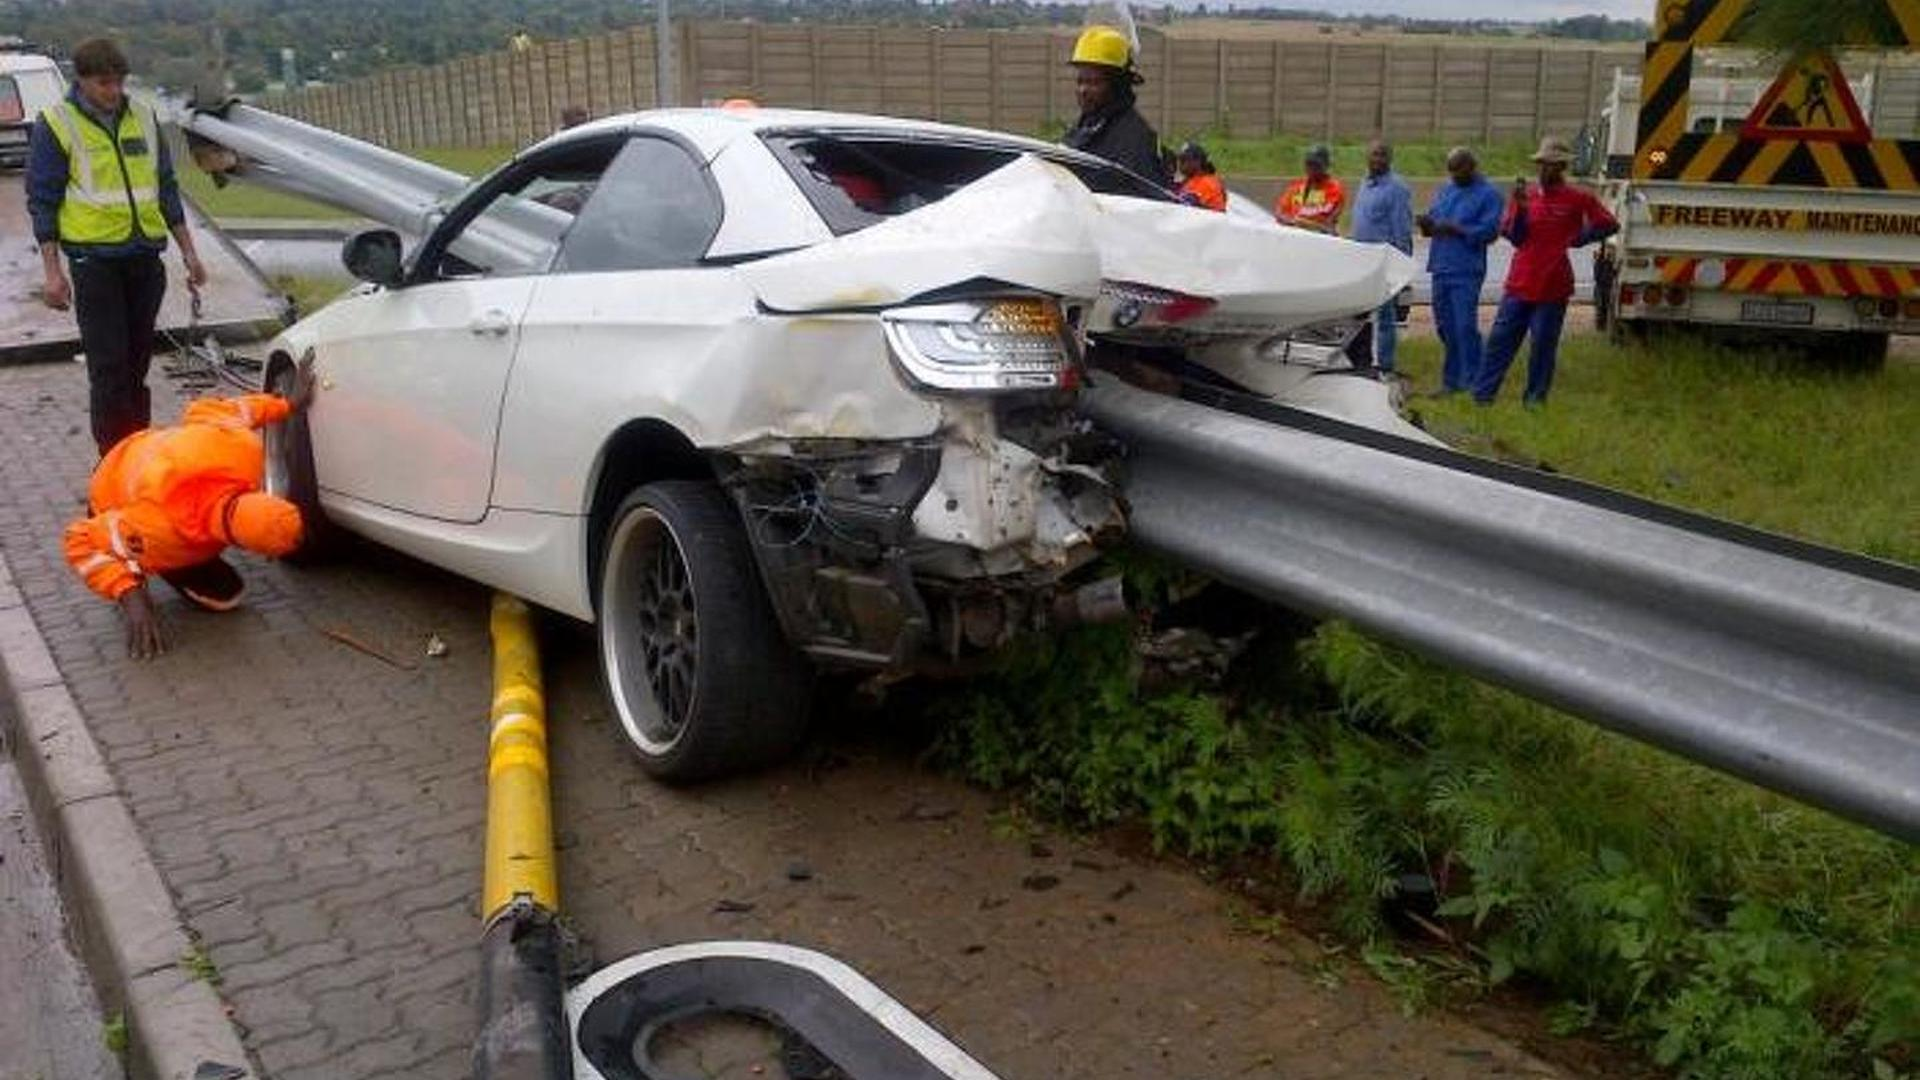 Amazing Crash Bmw 335i Hits Guard Rail No One Gets Hurt